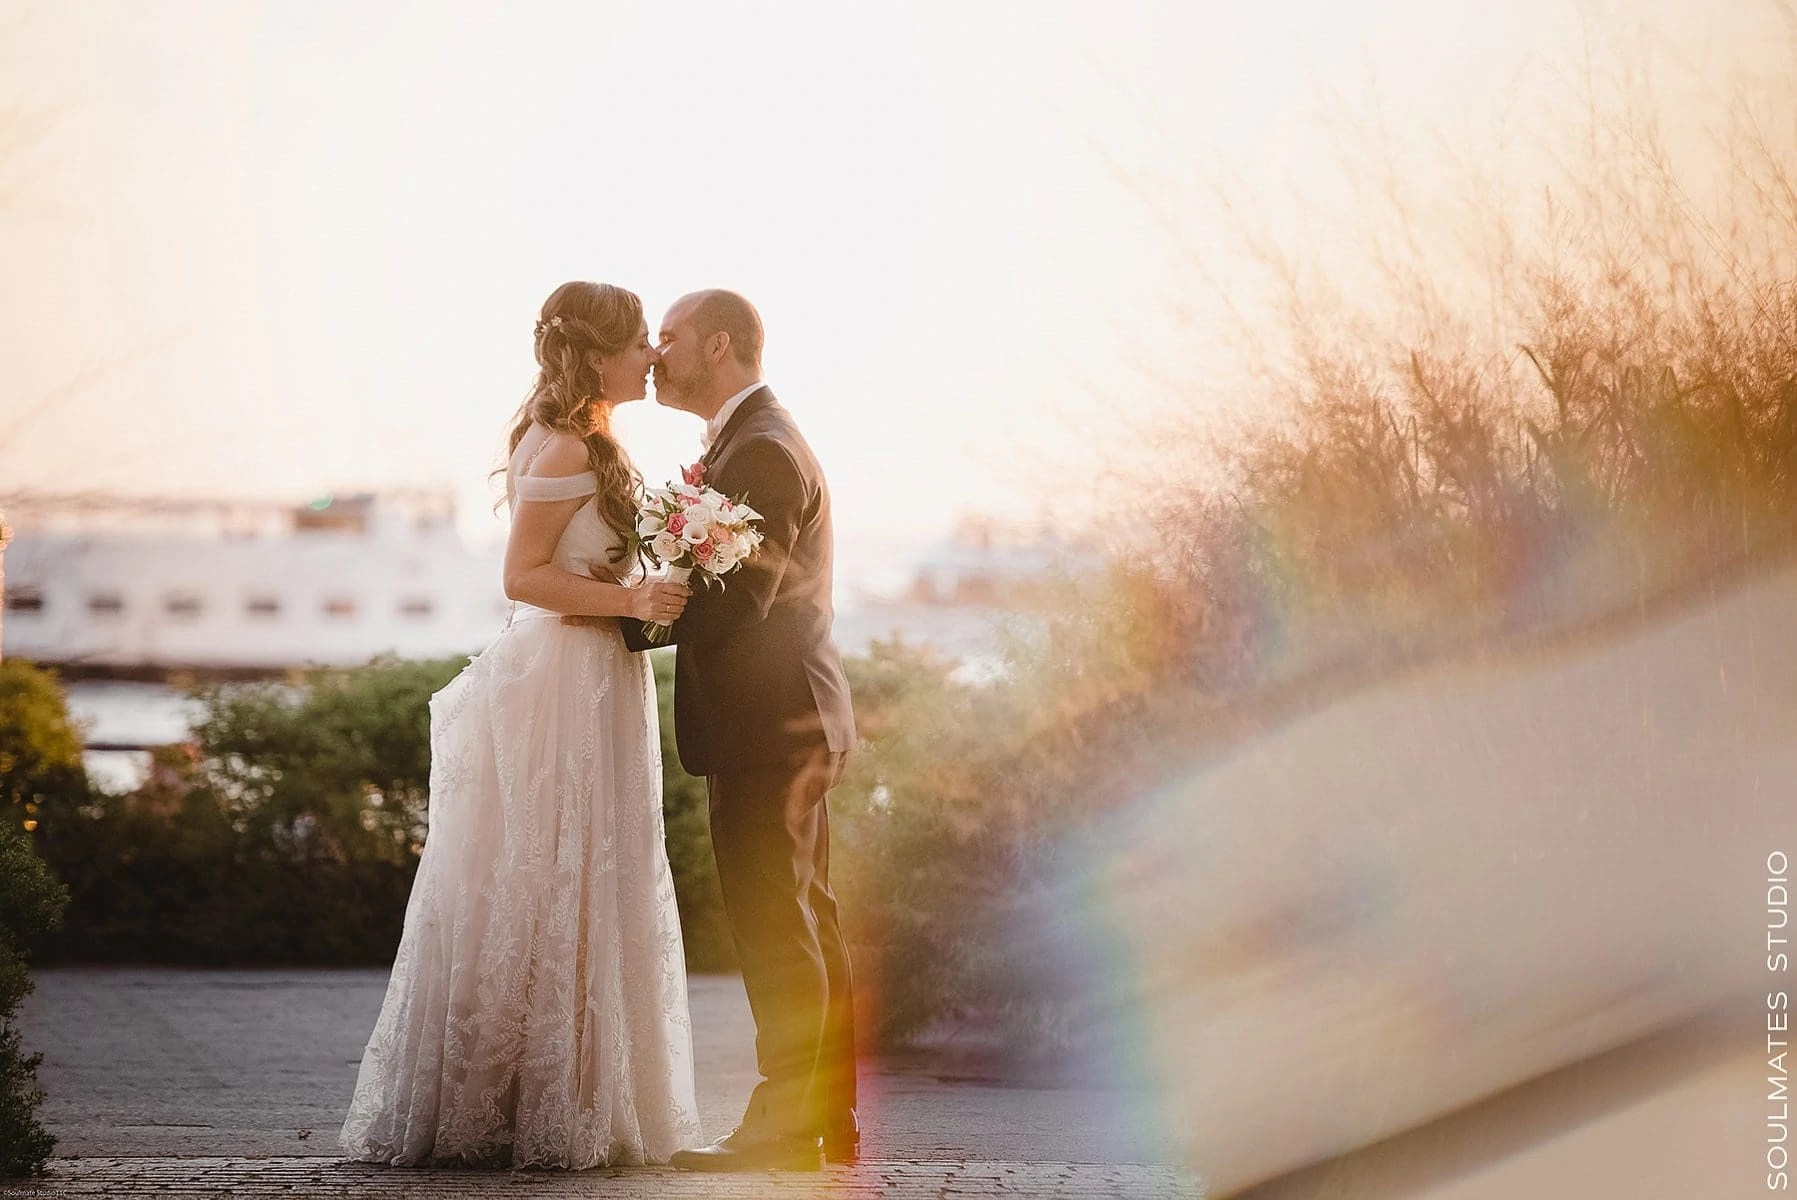 Manhattan Battery Garden City Wedding Bride and Groom portrait at the sunset